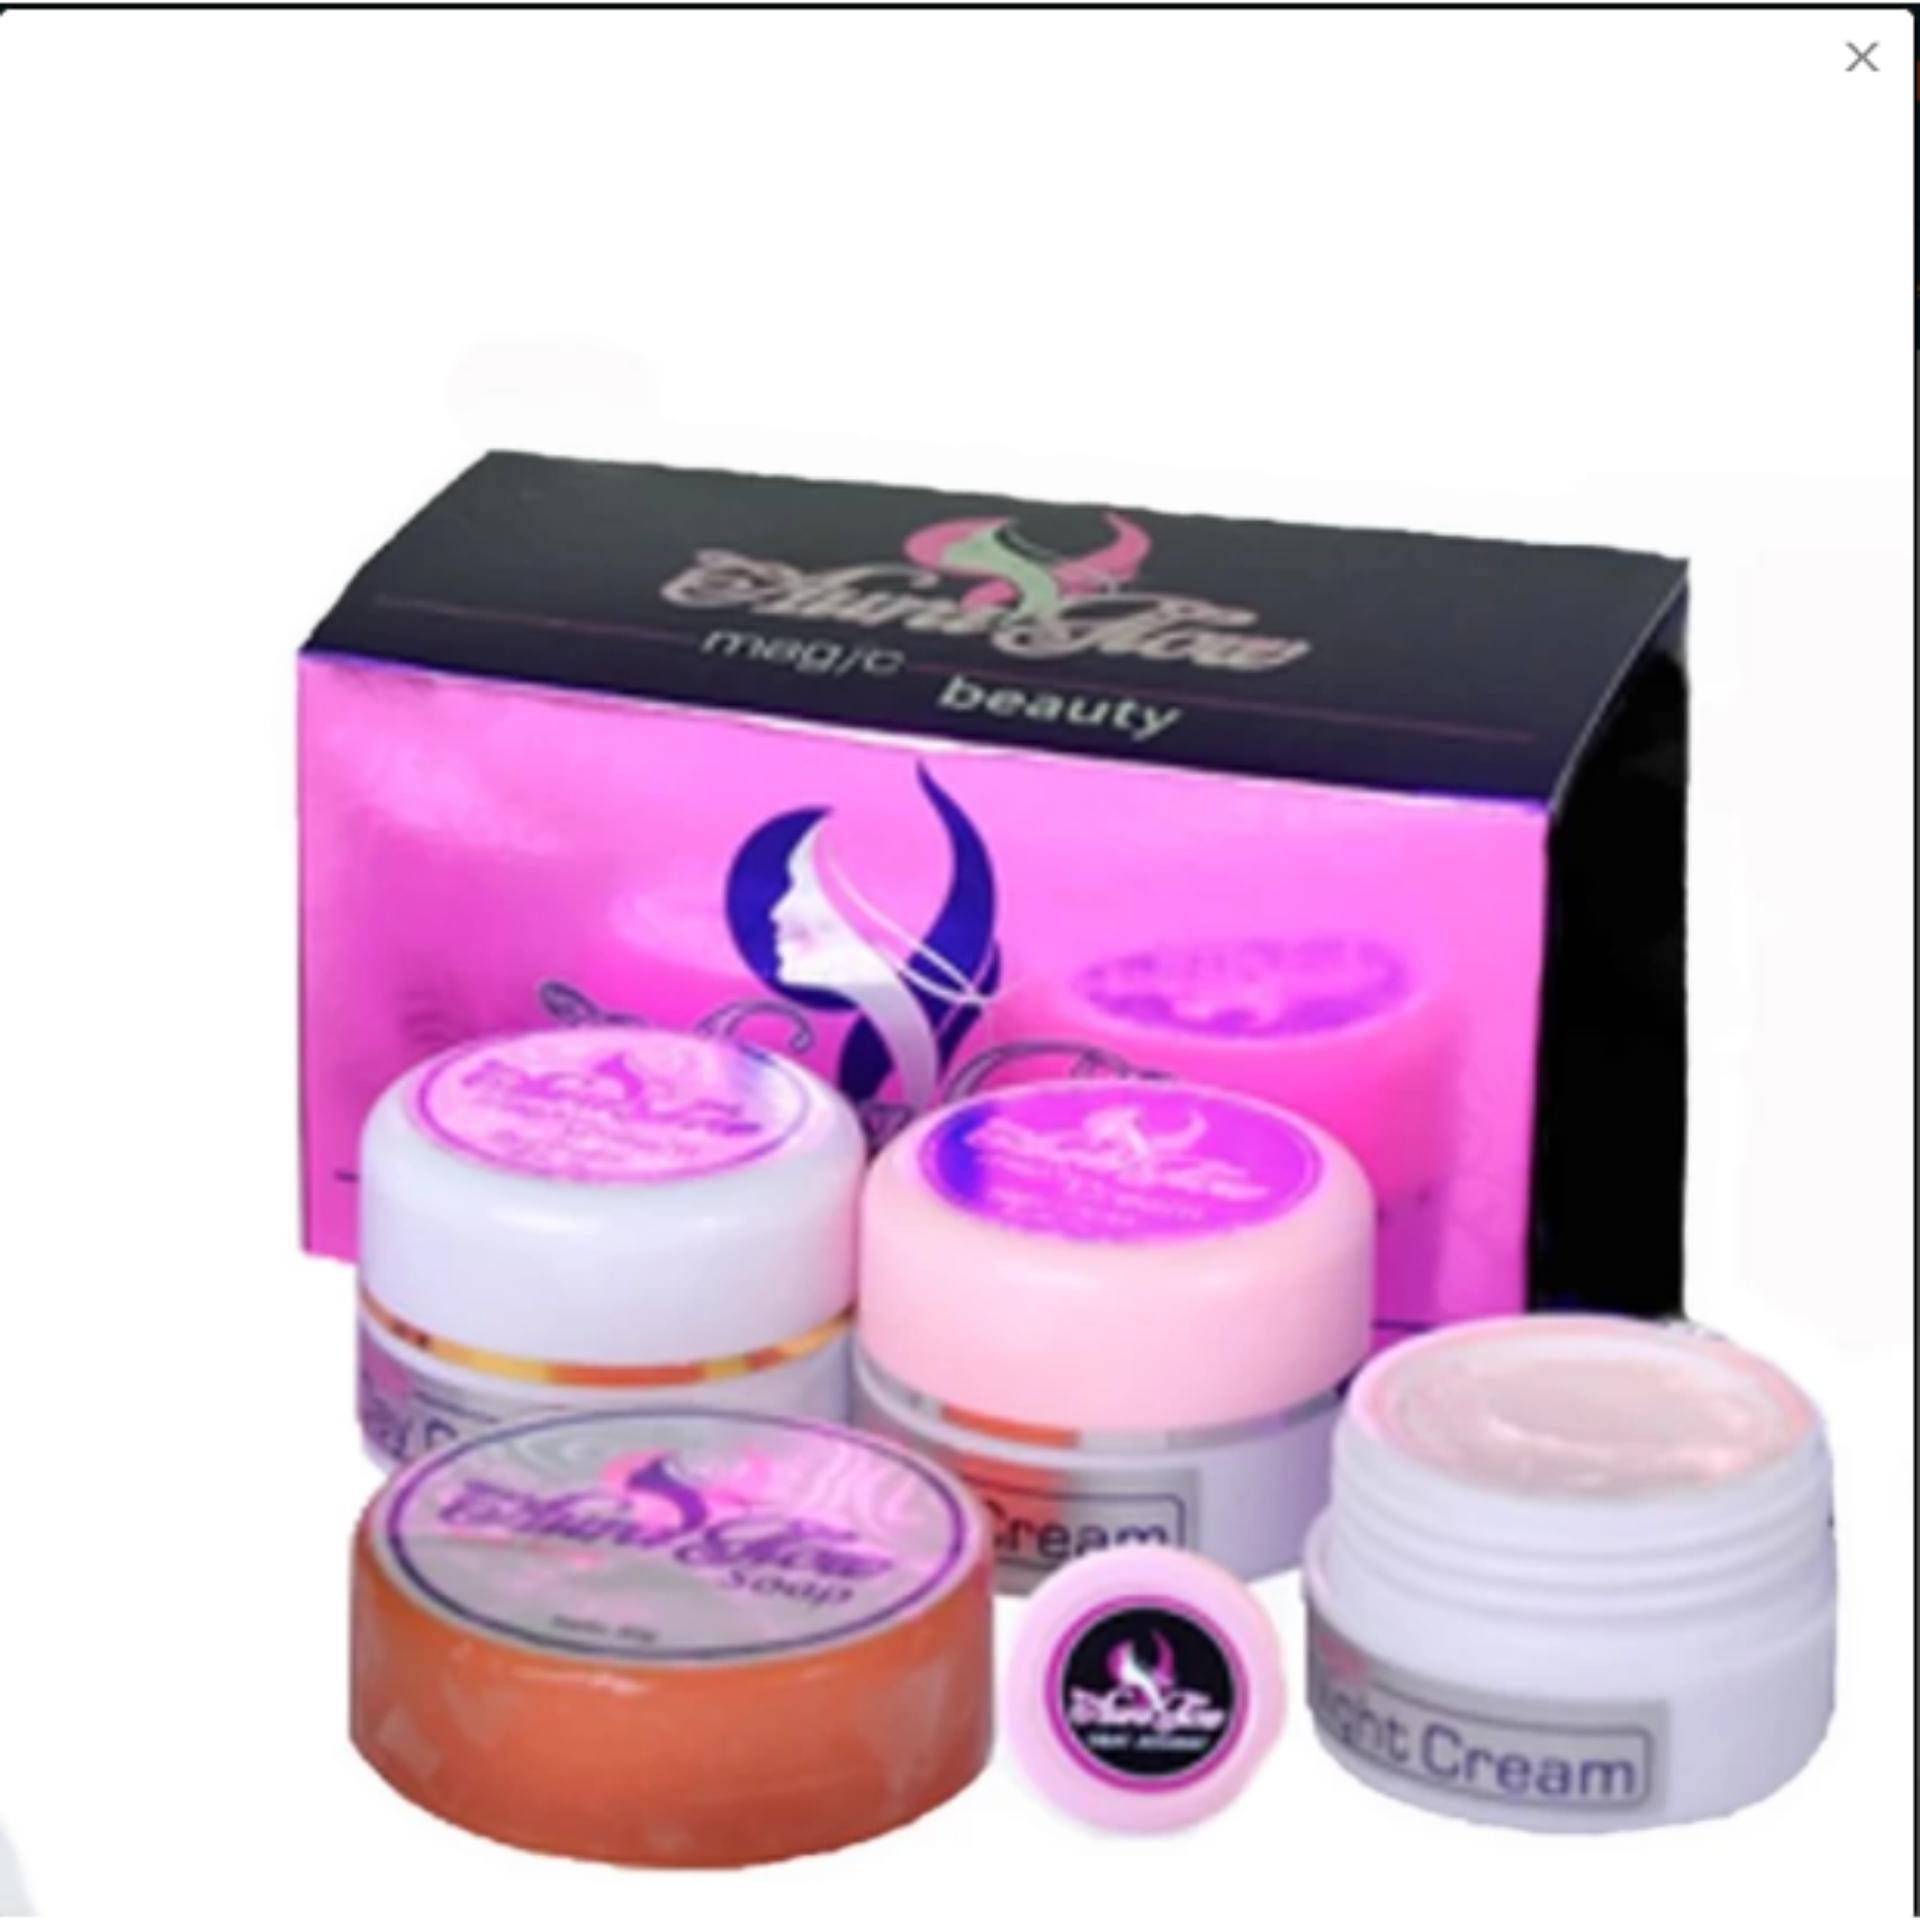 Hemat Aura Glow Magic Beauty Cream Paket Perawatan Wajah Jerawat Ertos Night Bpom Original Malam Anti Acne Krim Pagi Sabun Aman